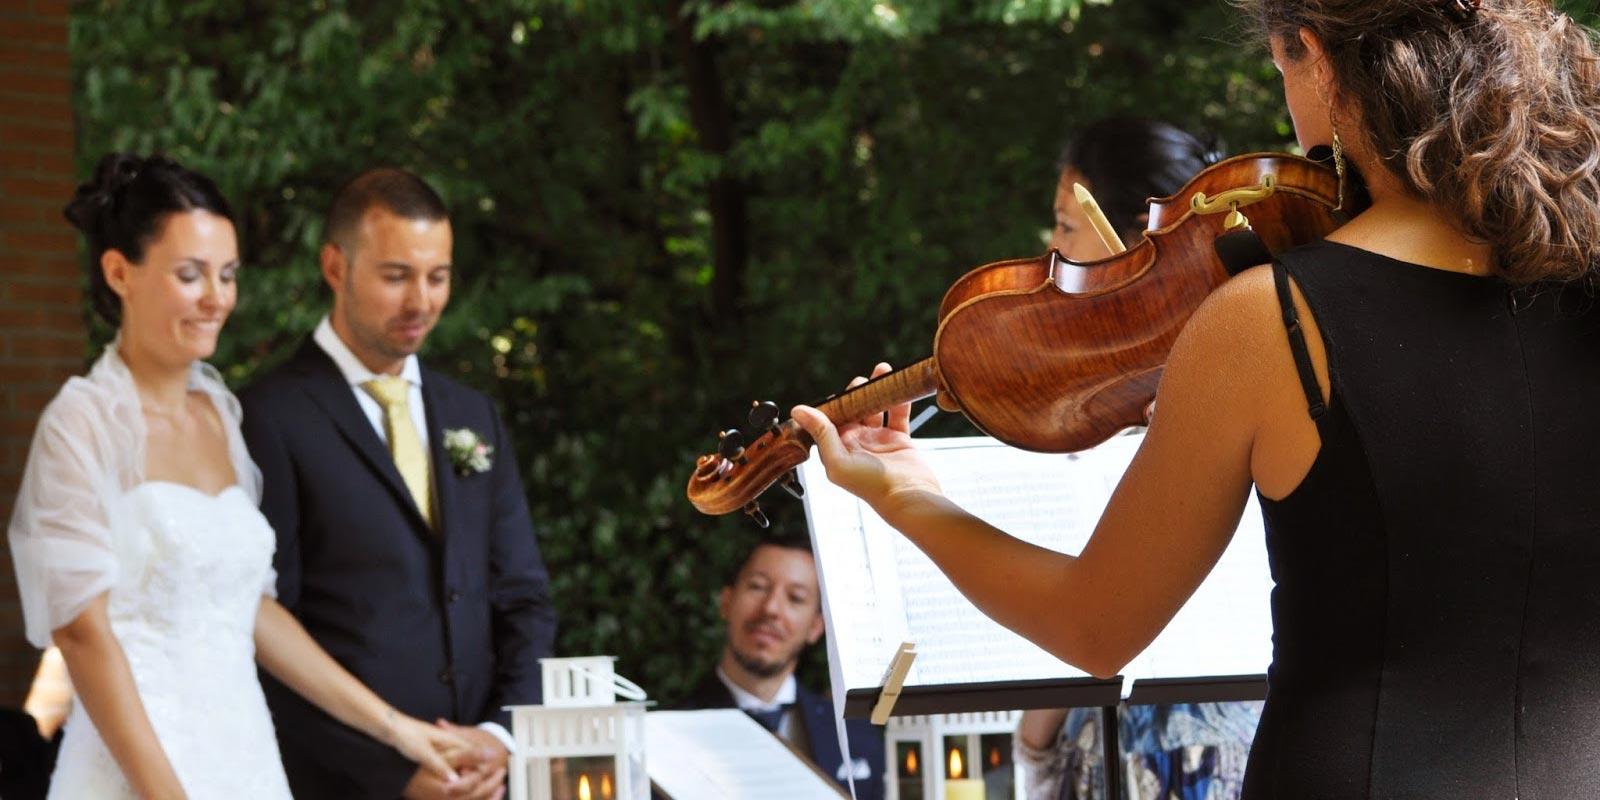 Celebrante Matrimonio Simbolico Novara : Musica per matrimonio simbolico celebrante